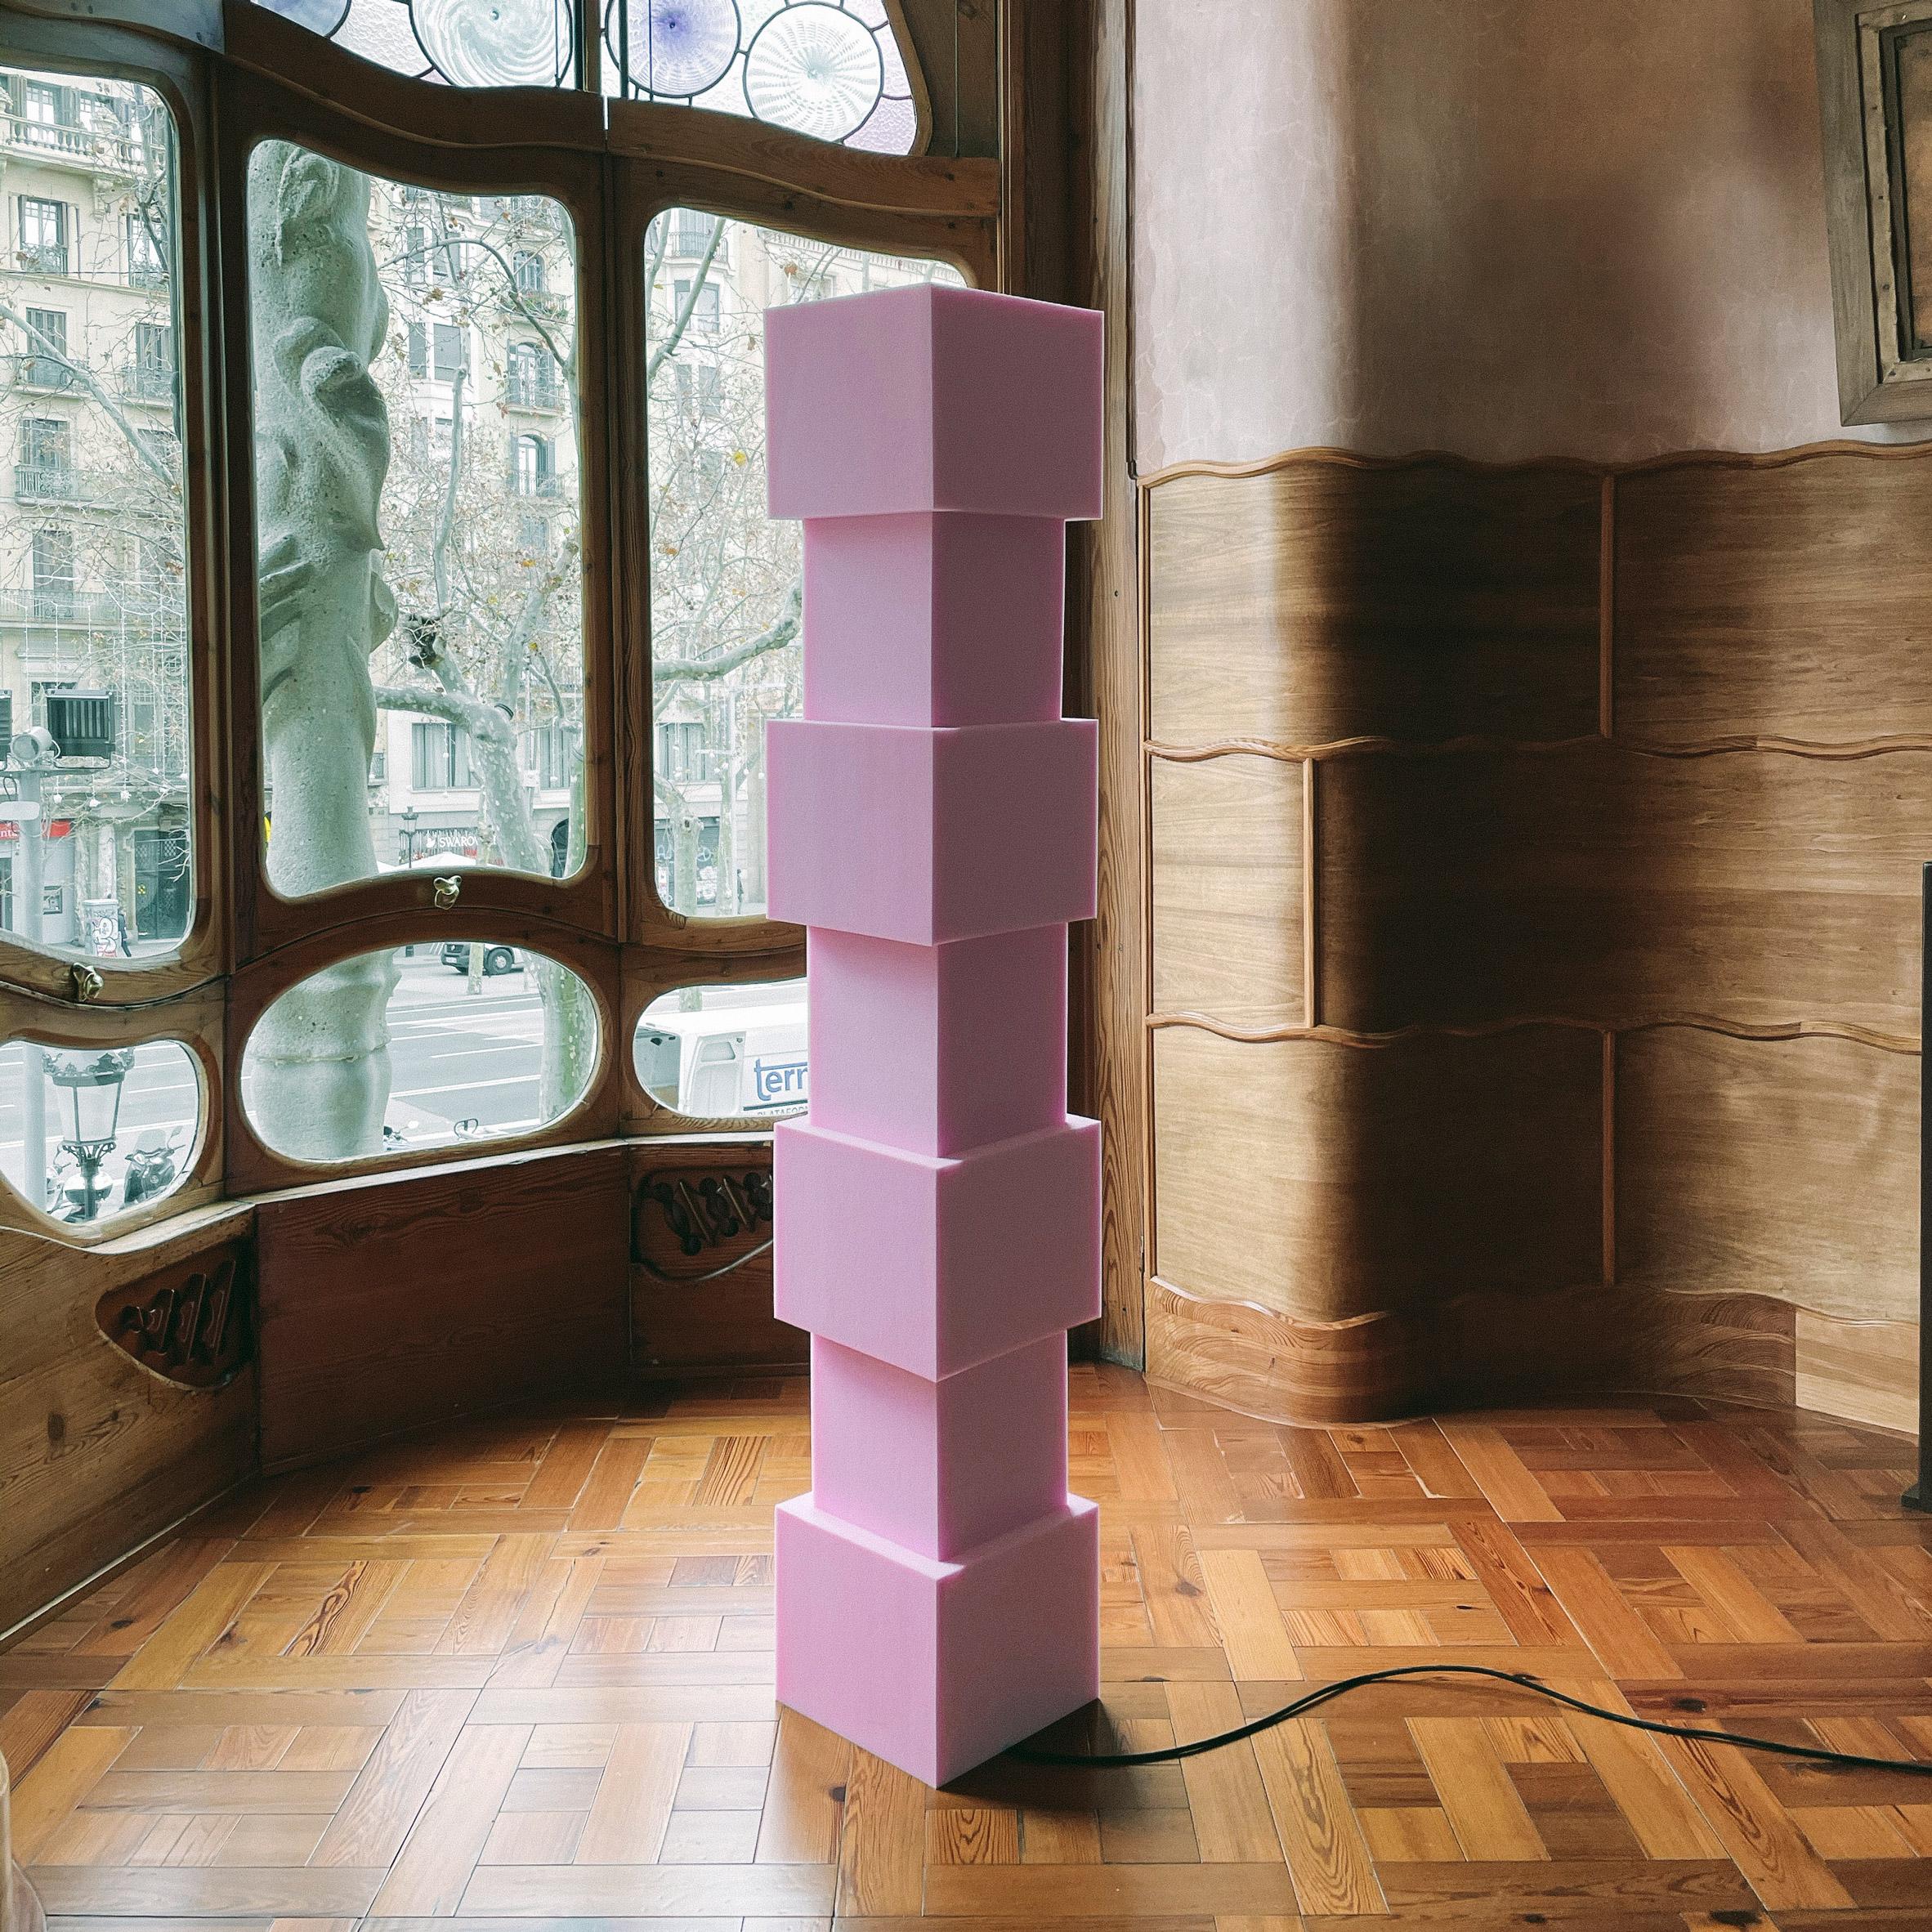 Cuboid pink foam light photographed in Casa Batlló